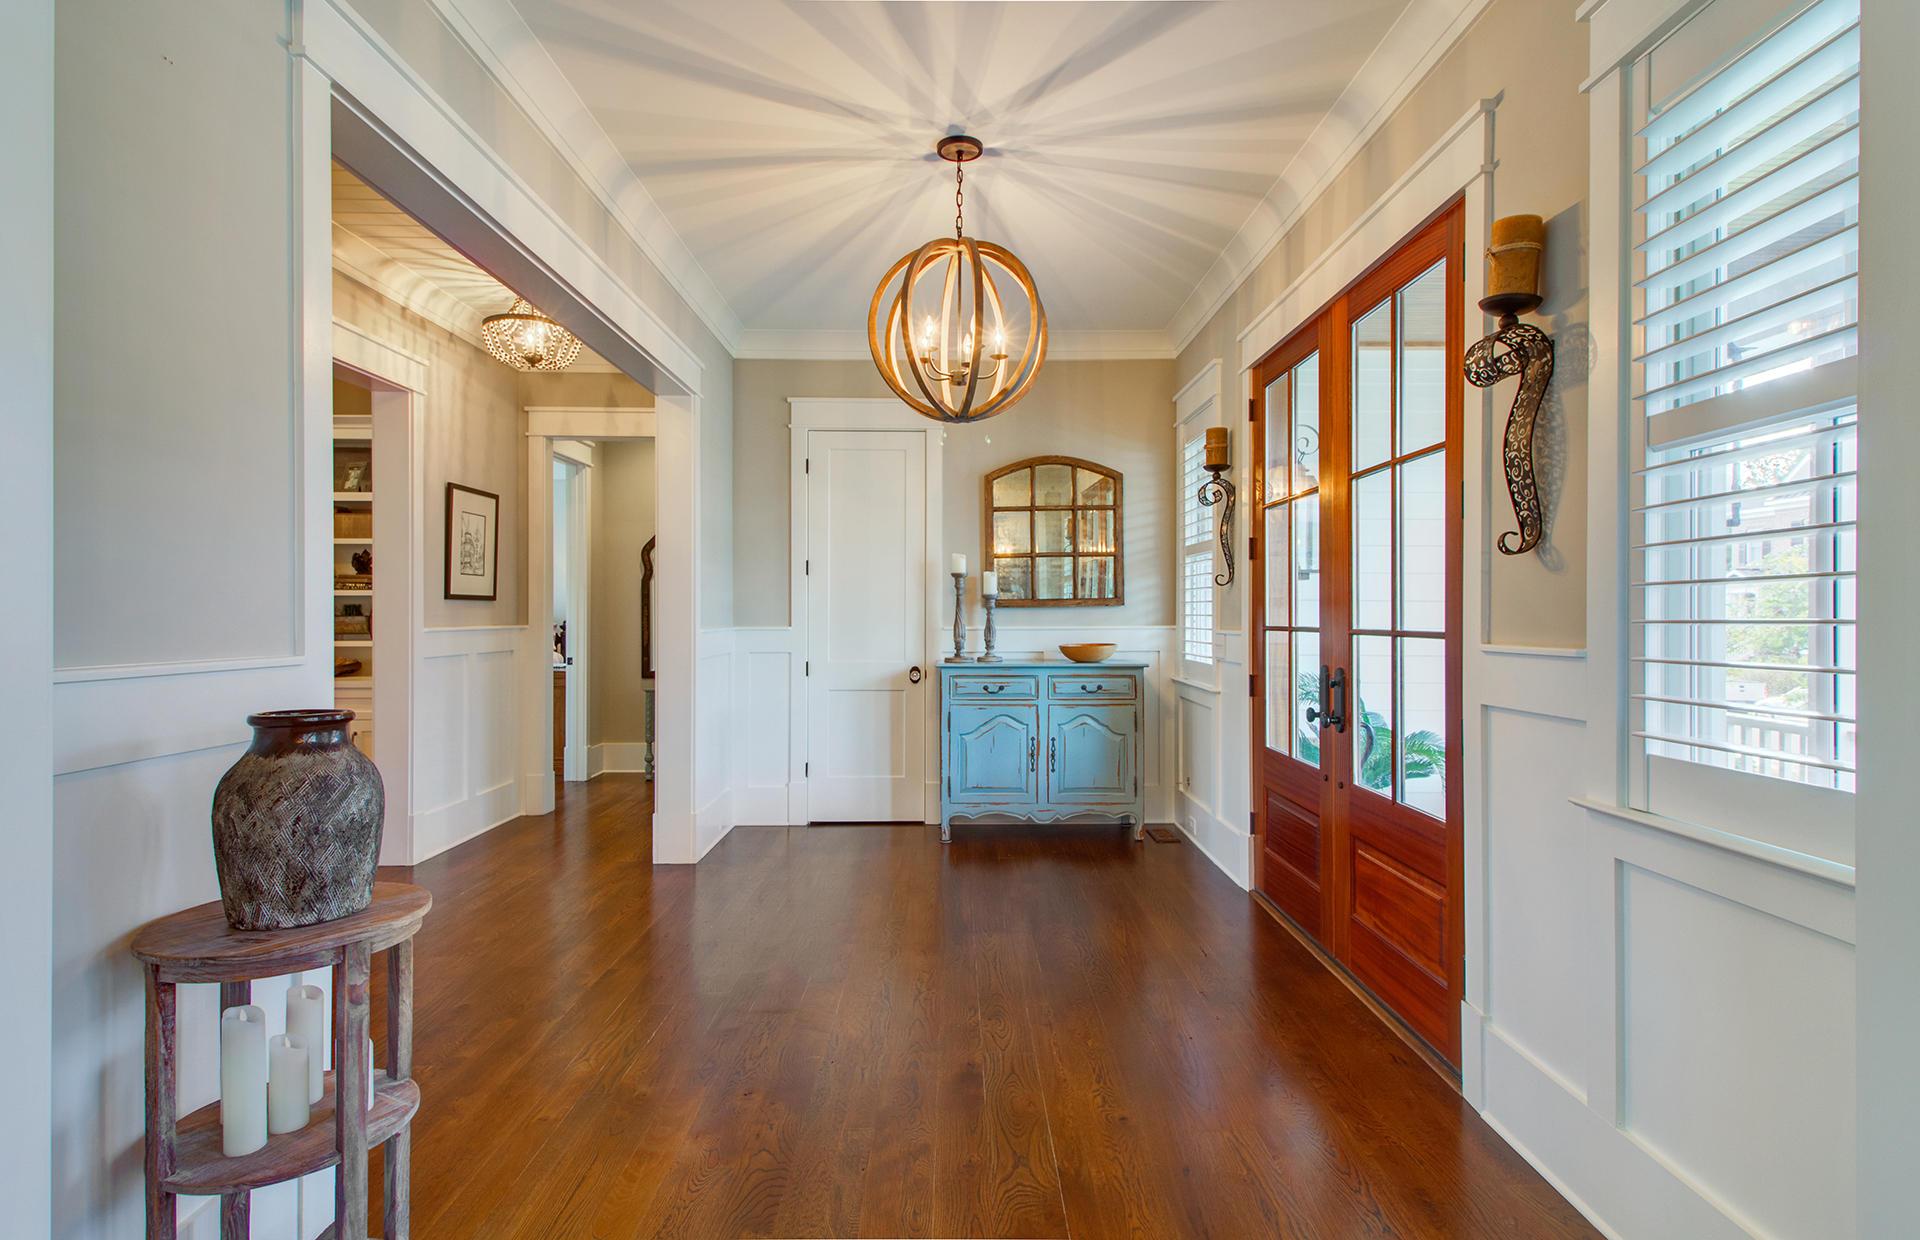 Daniel Island Park Homes For Sale - 117 Brailsford, Charleston, SC - 5